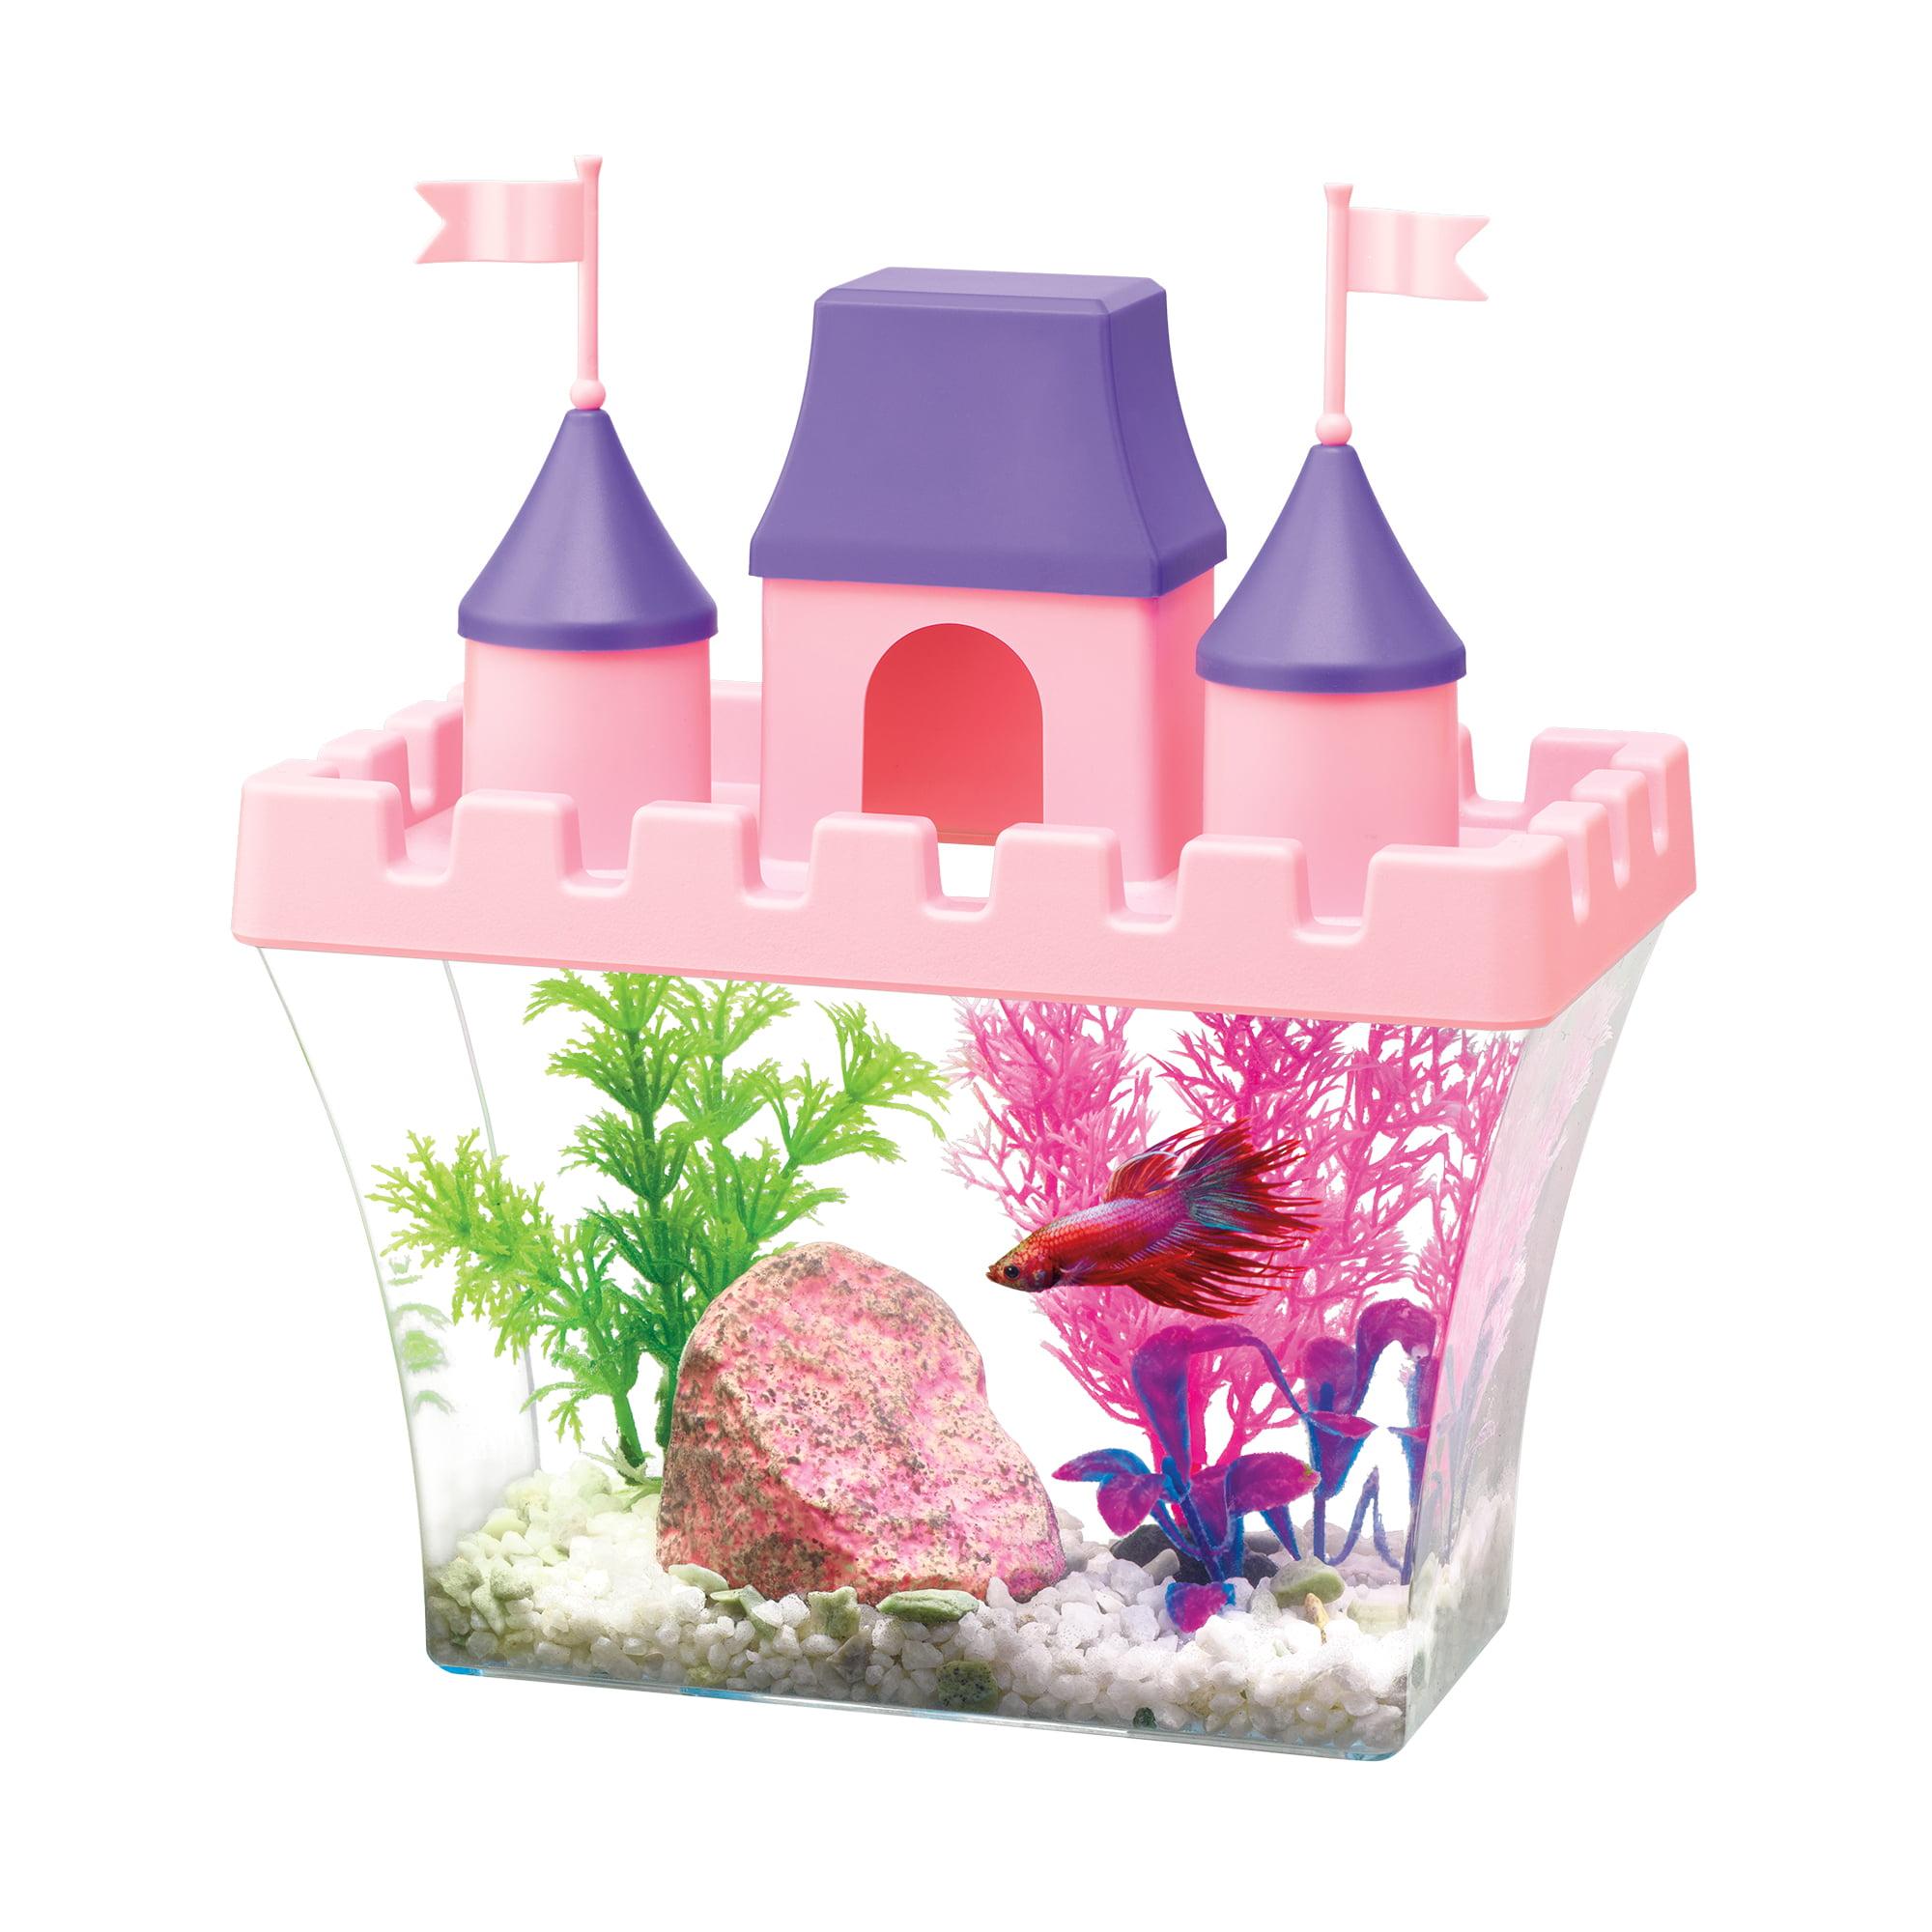 Aqueon Princess Castle Aquarium Starter Kit by All Glass Aquarium Co. Inc